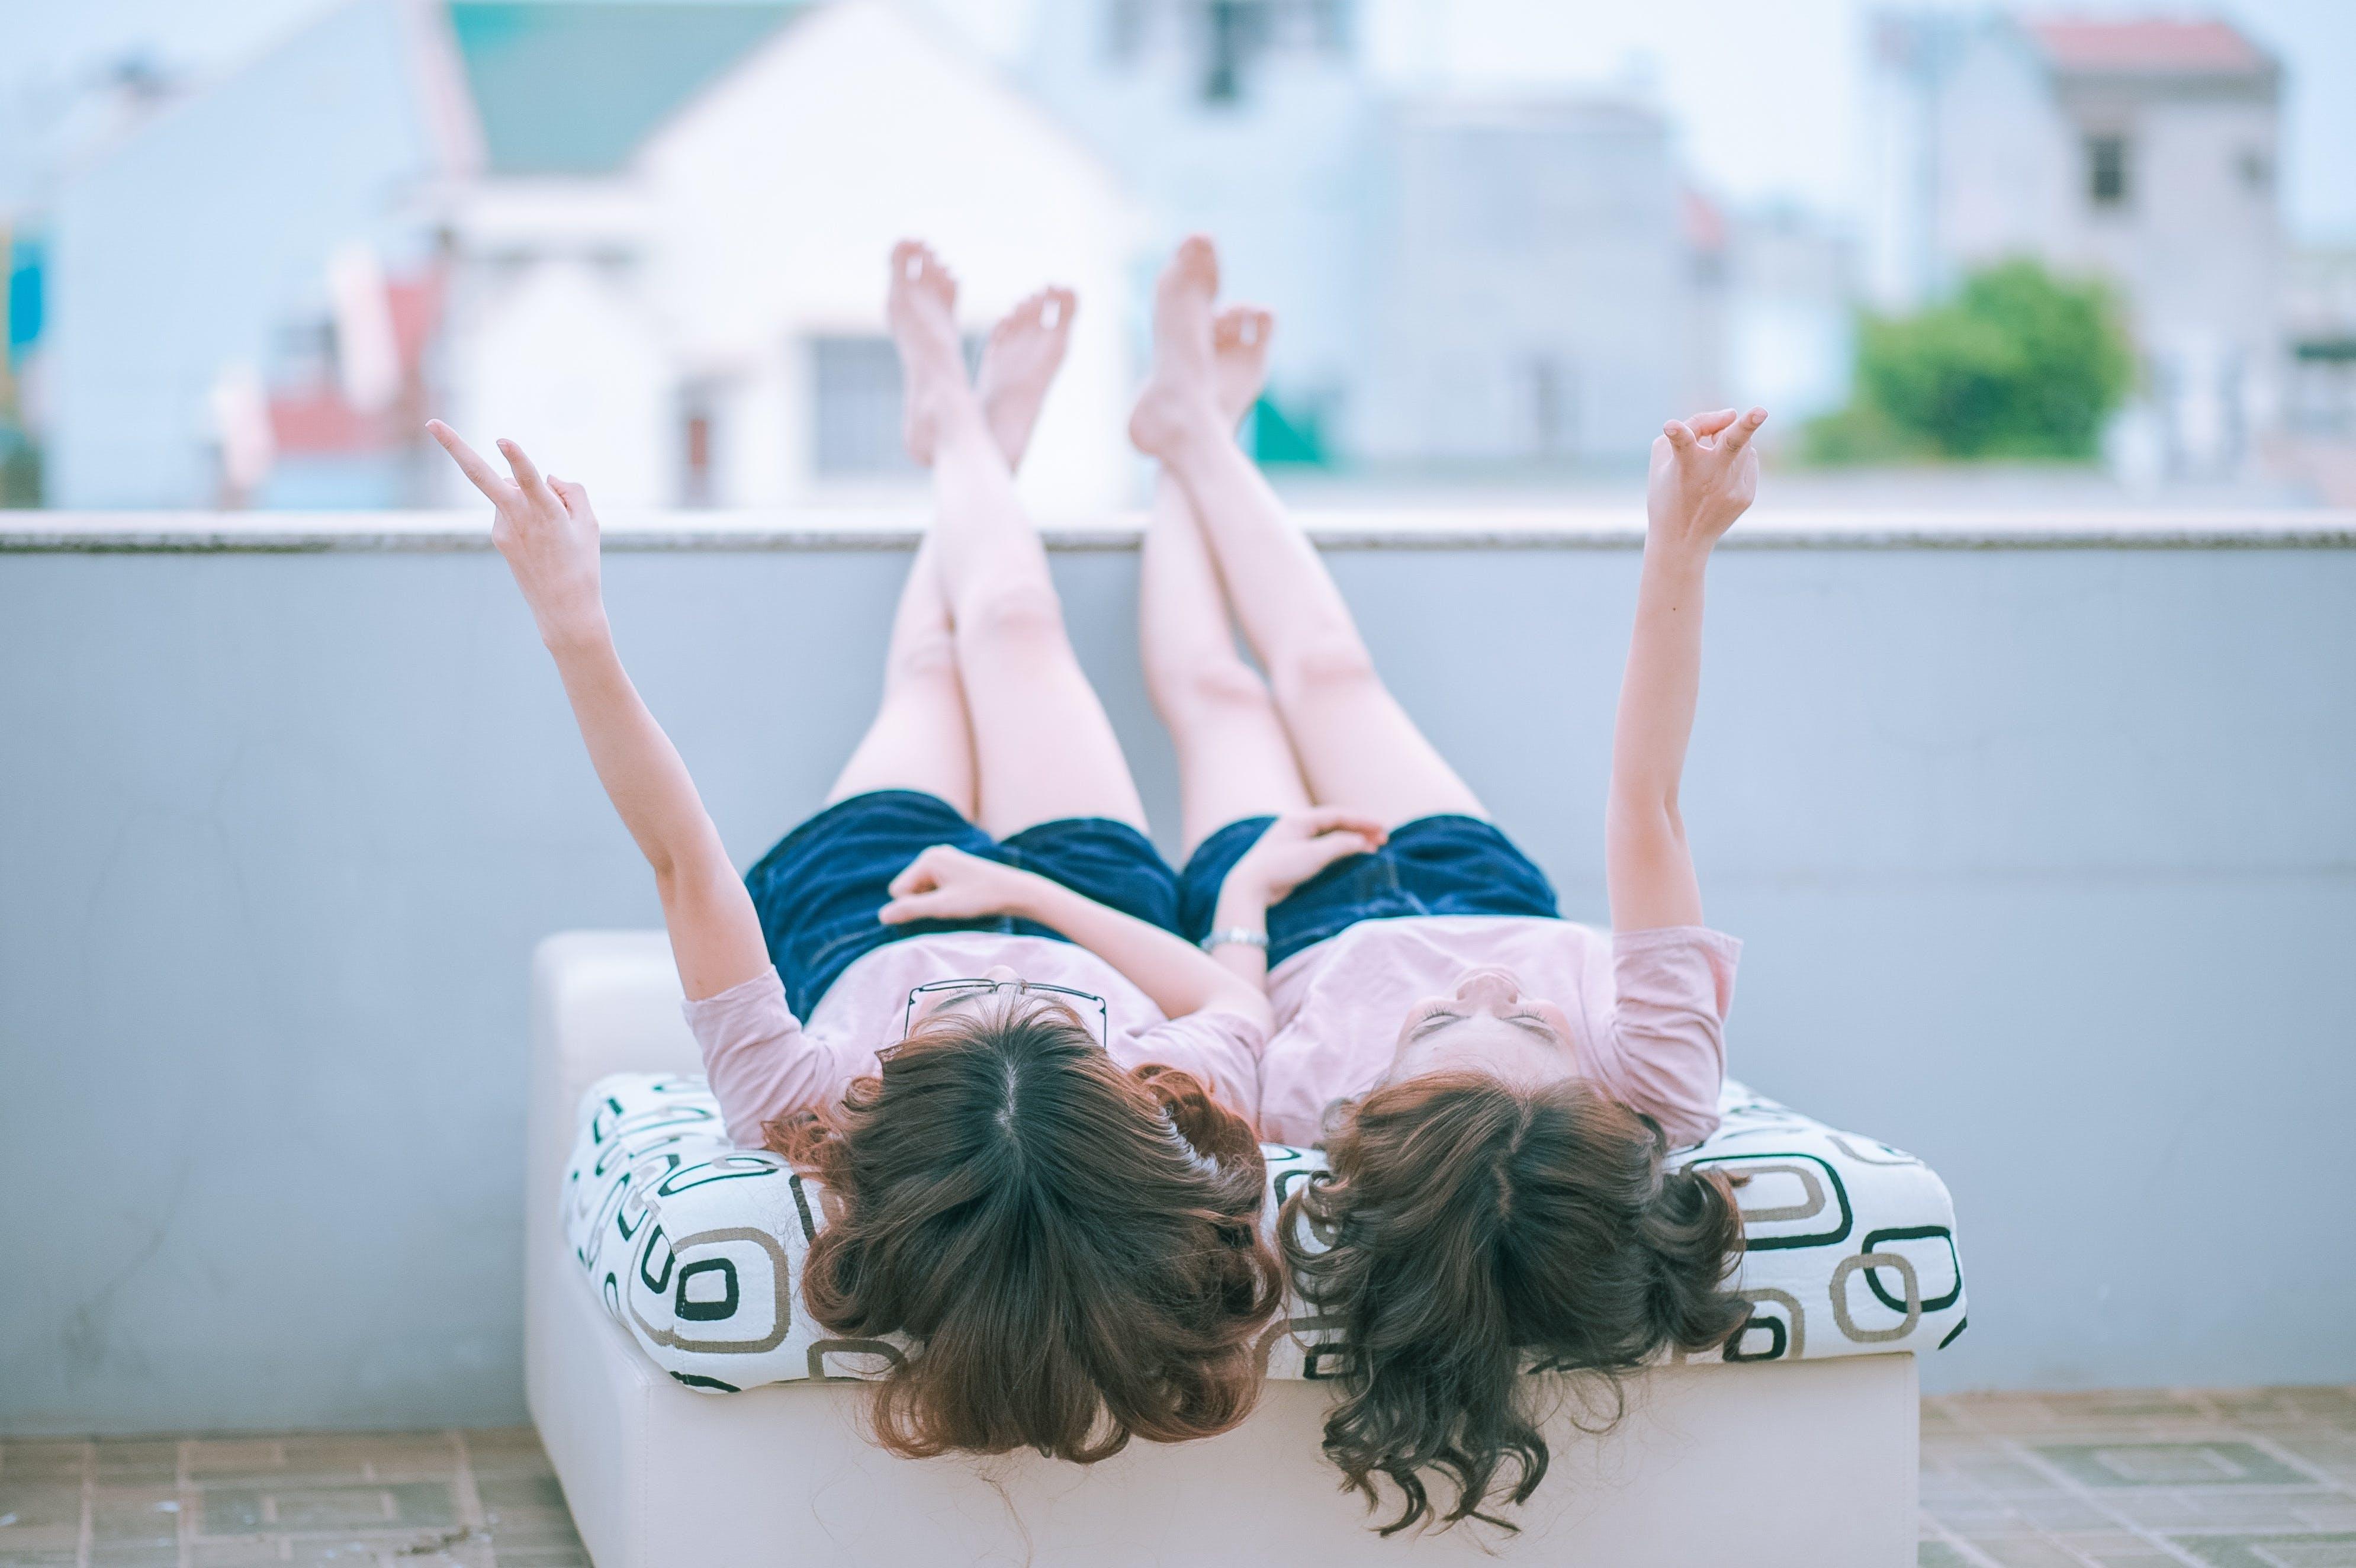 Kostenloses Stock Foto zu entspannung, frauen, freude, freunde